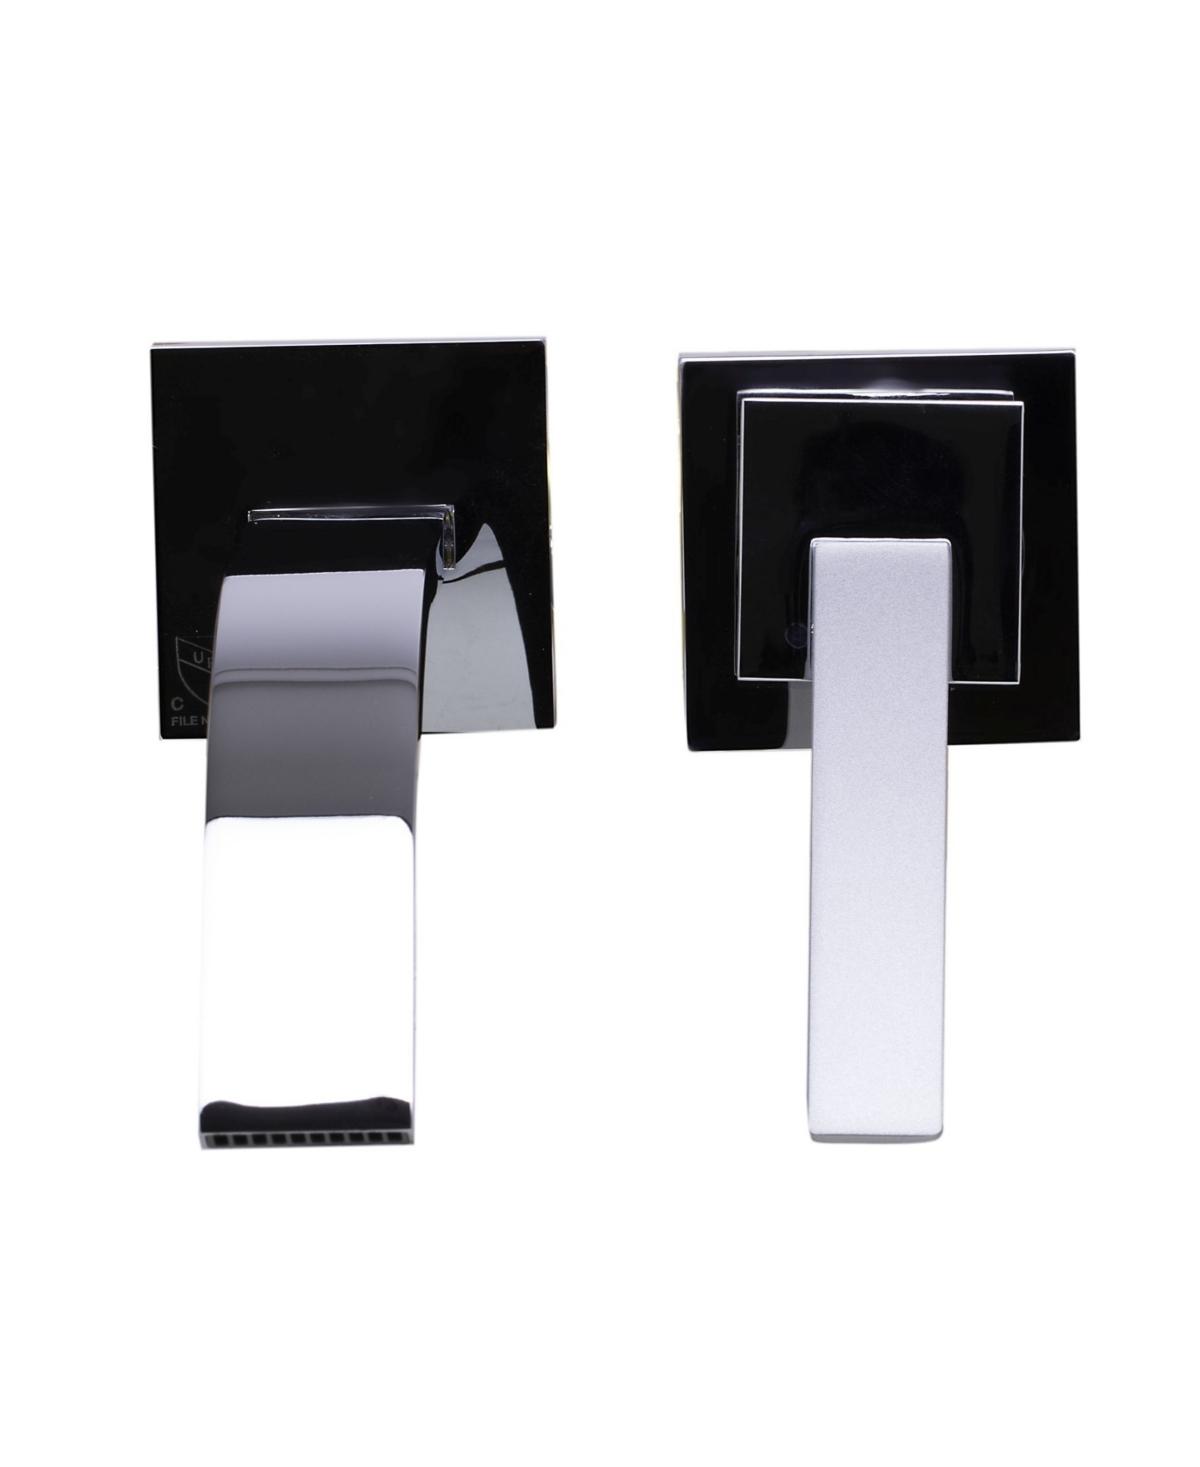 Alfi brand Polished Chrome Single Lever Wallmount Bathroom Faucet Bedding